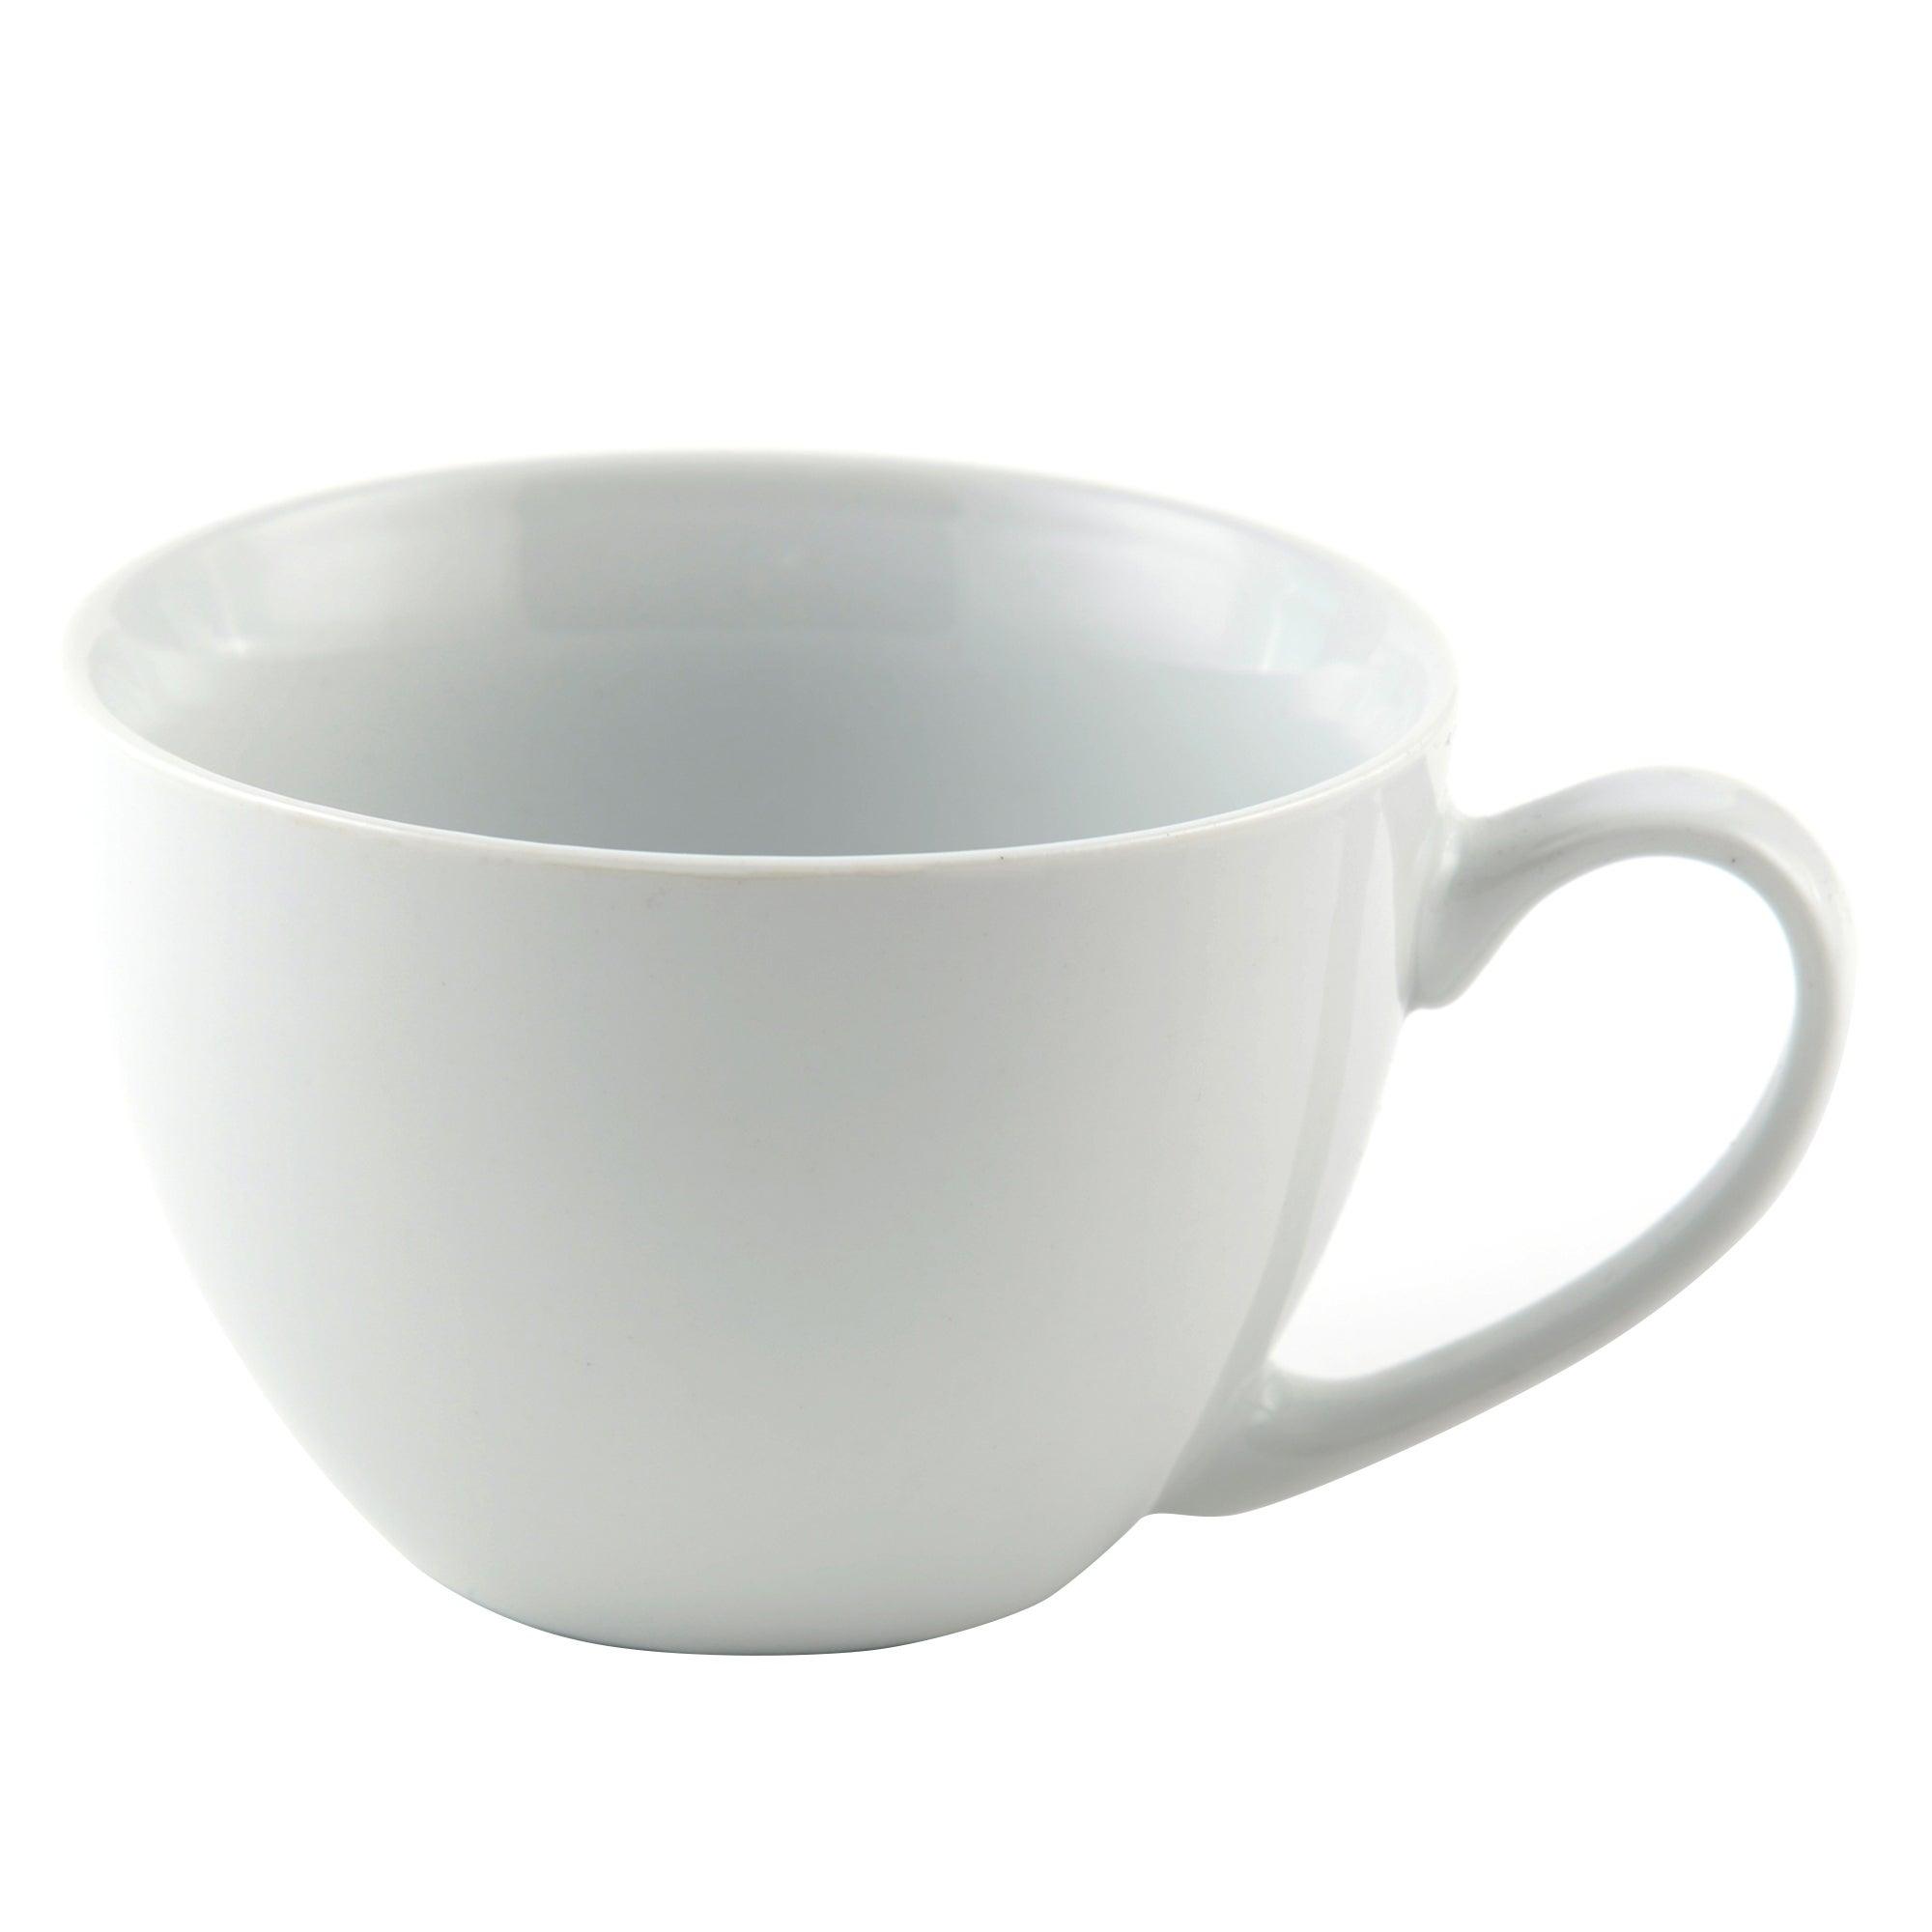 White Cappuccino Mug